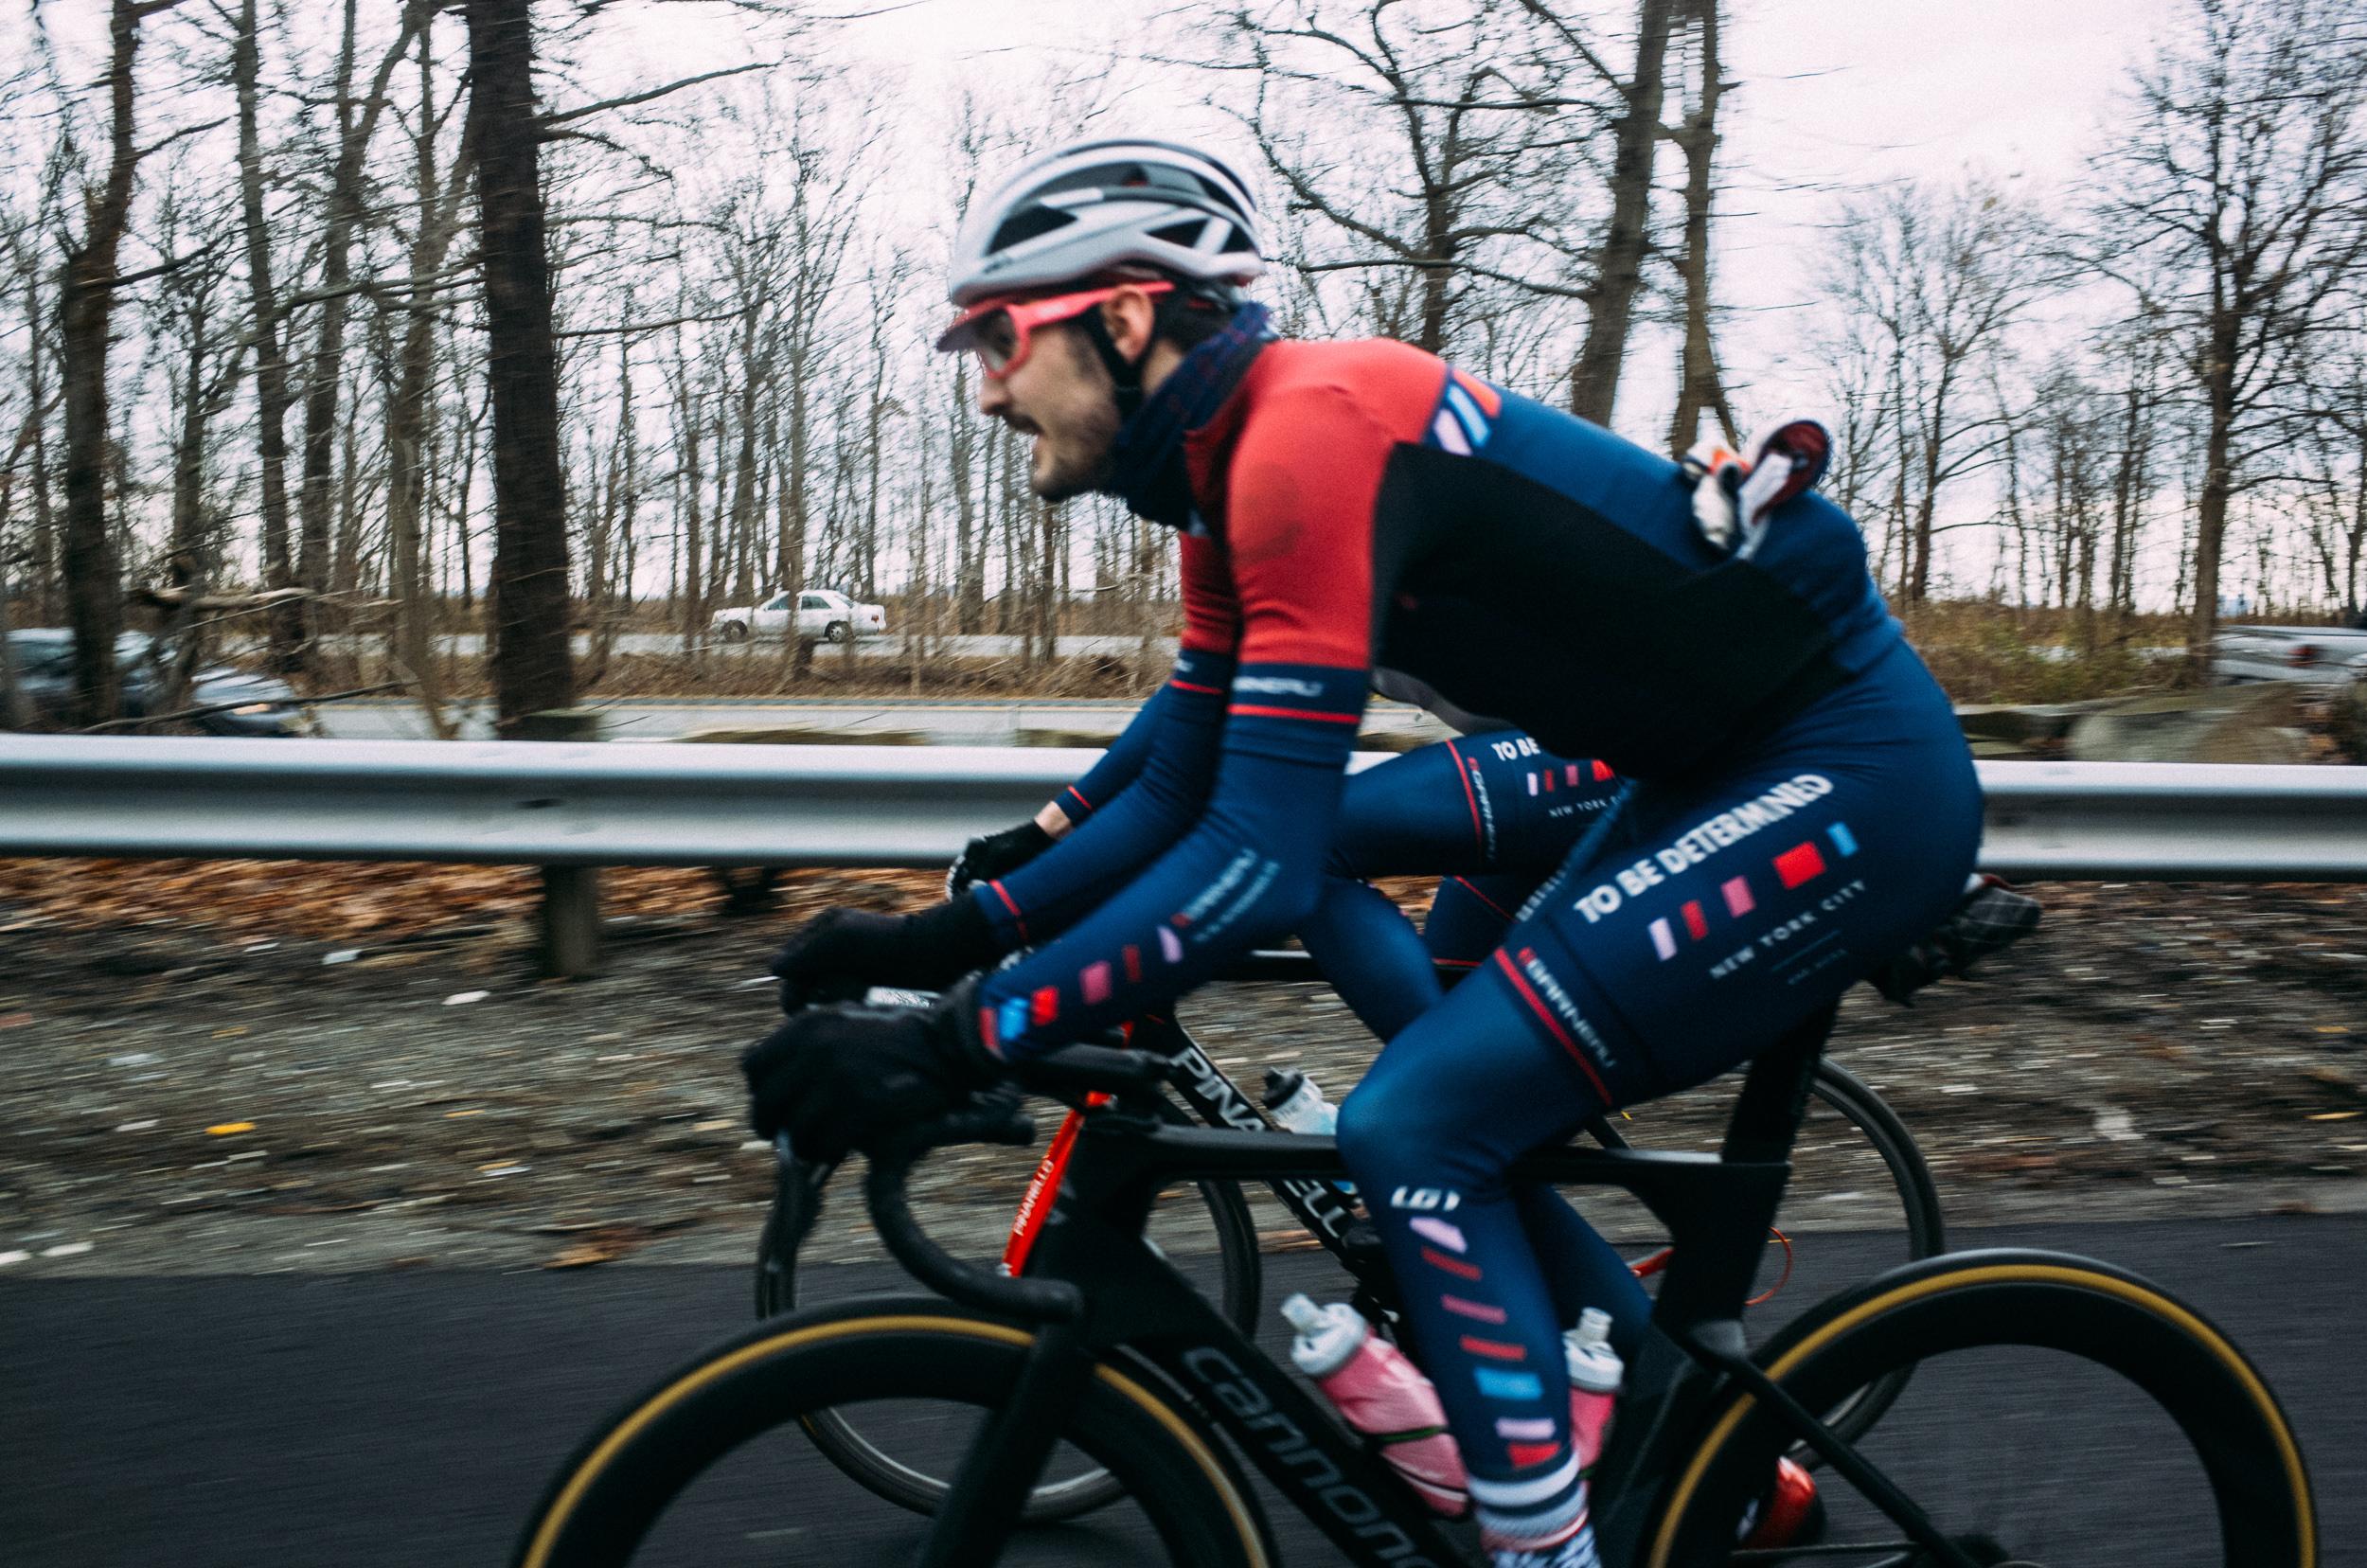 to-be-determined-photo-rhetoric-team-ride-january-1007.jpg